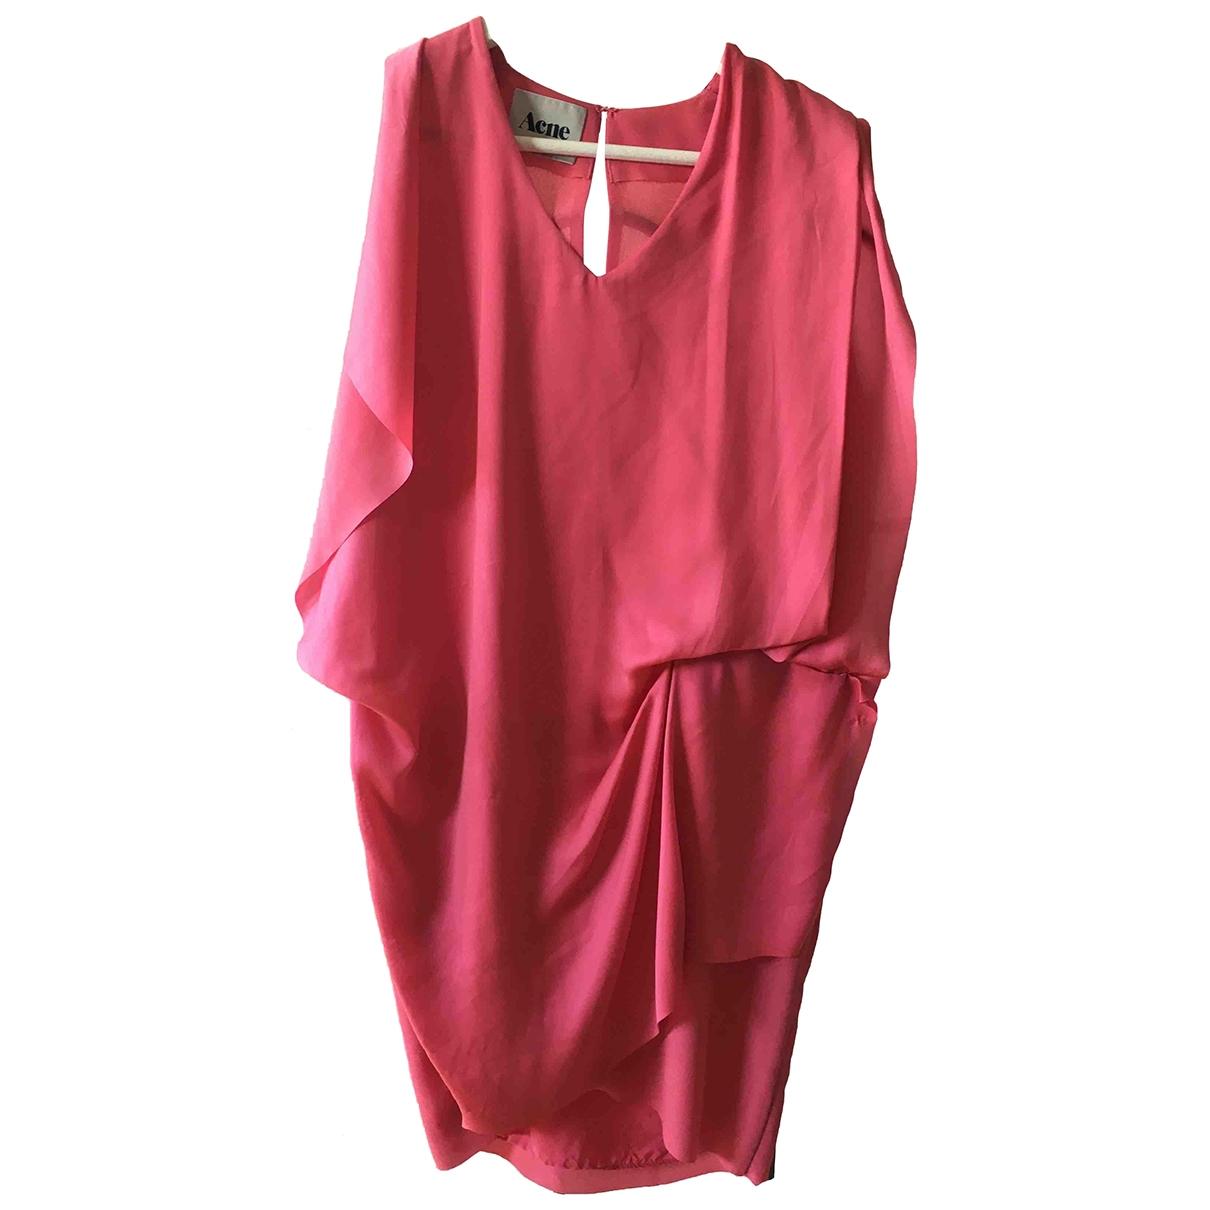 Acne Studios \N Pink dress for Women 36 FR